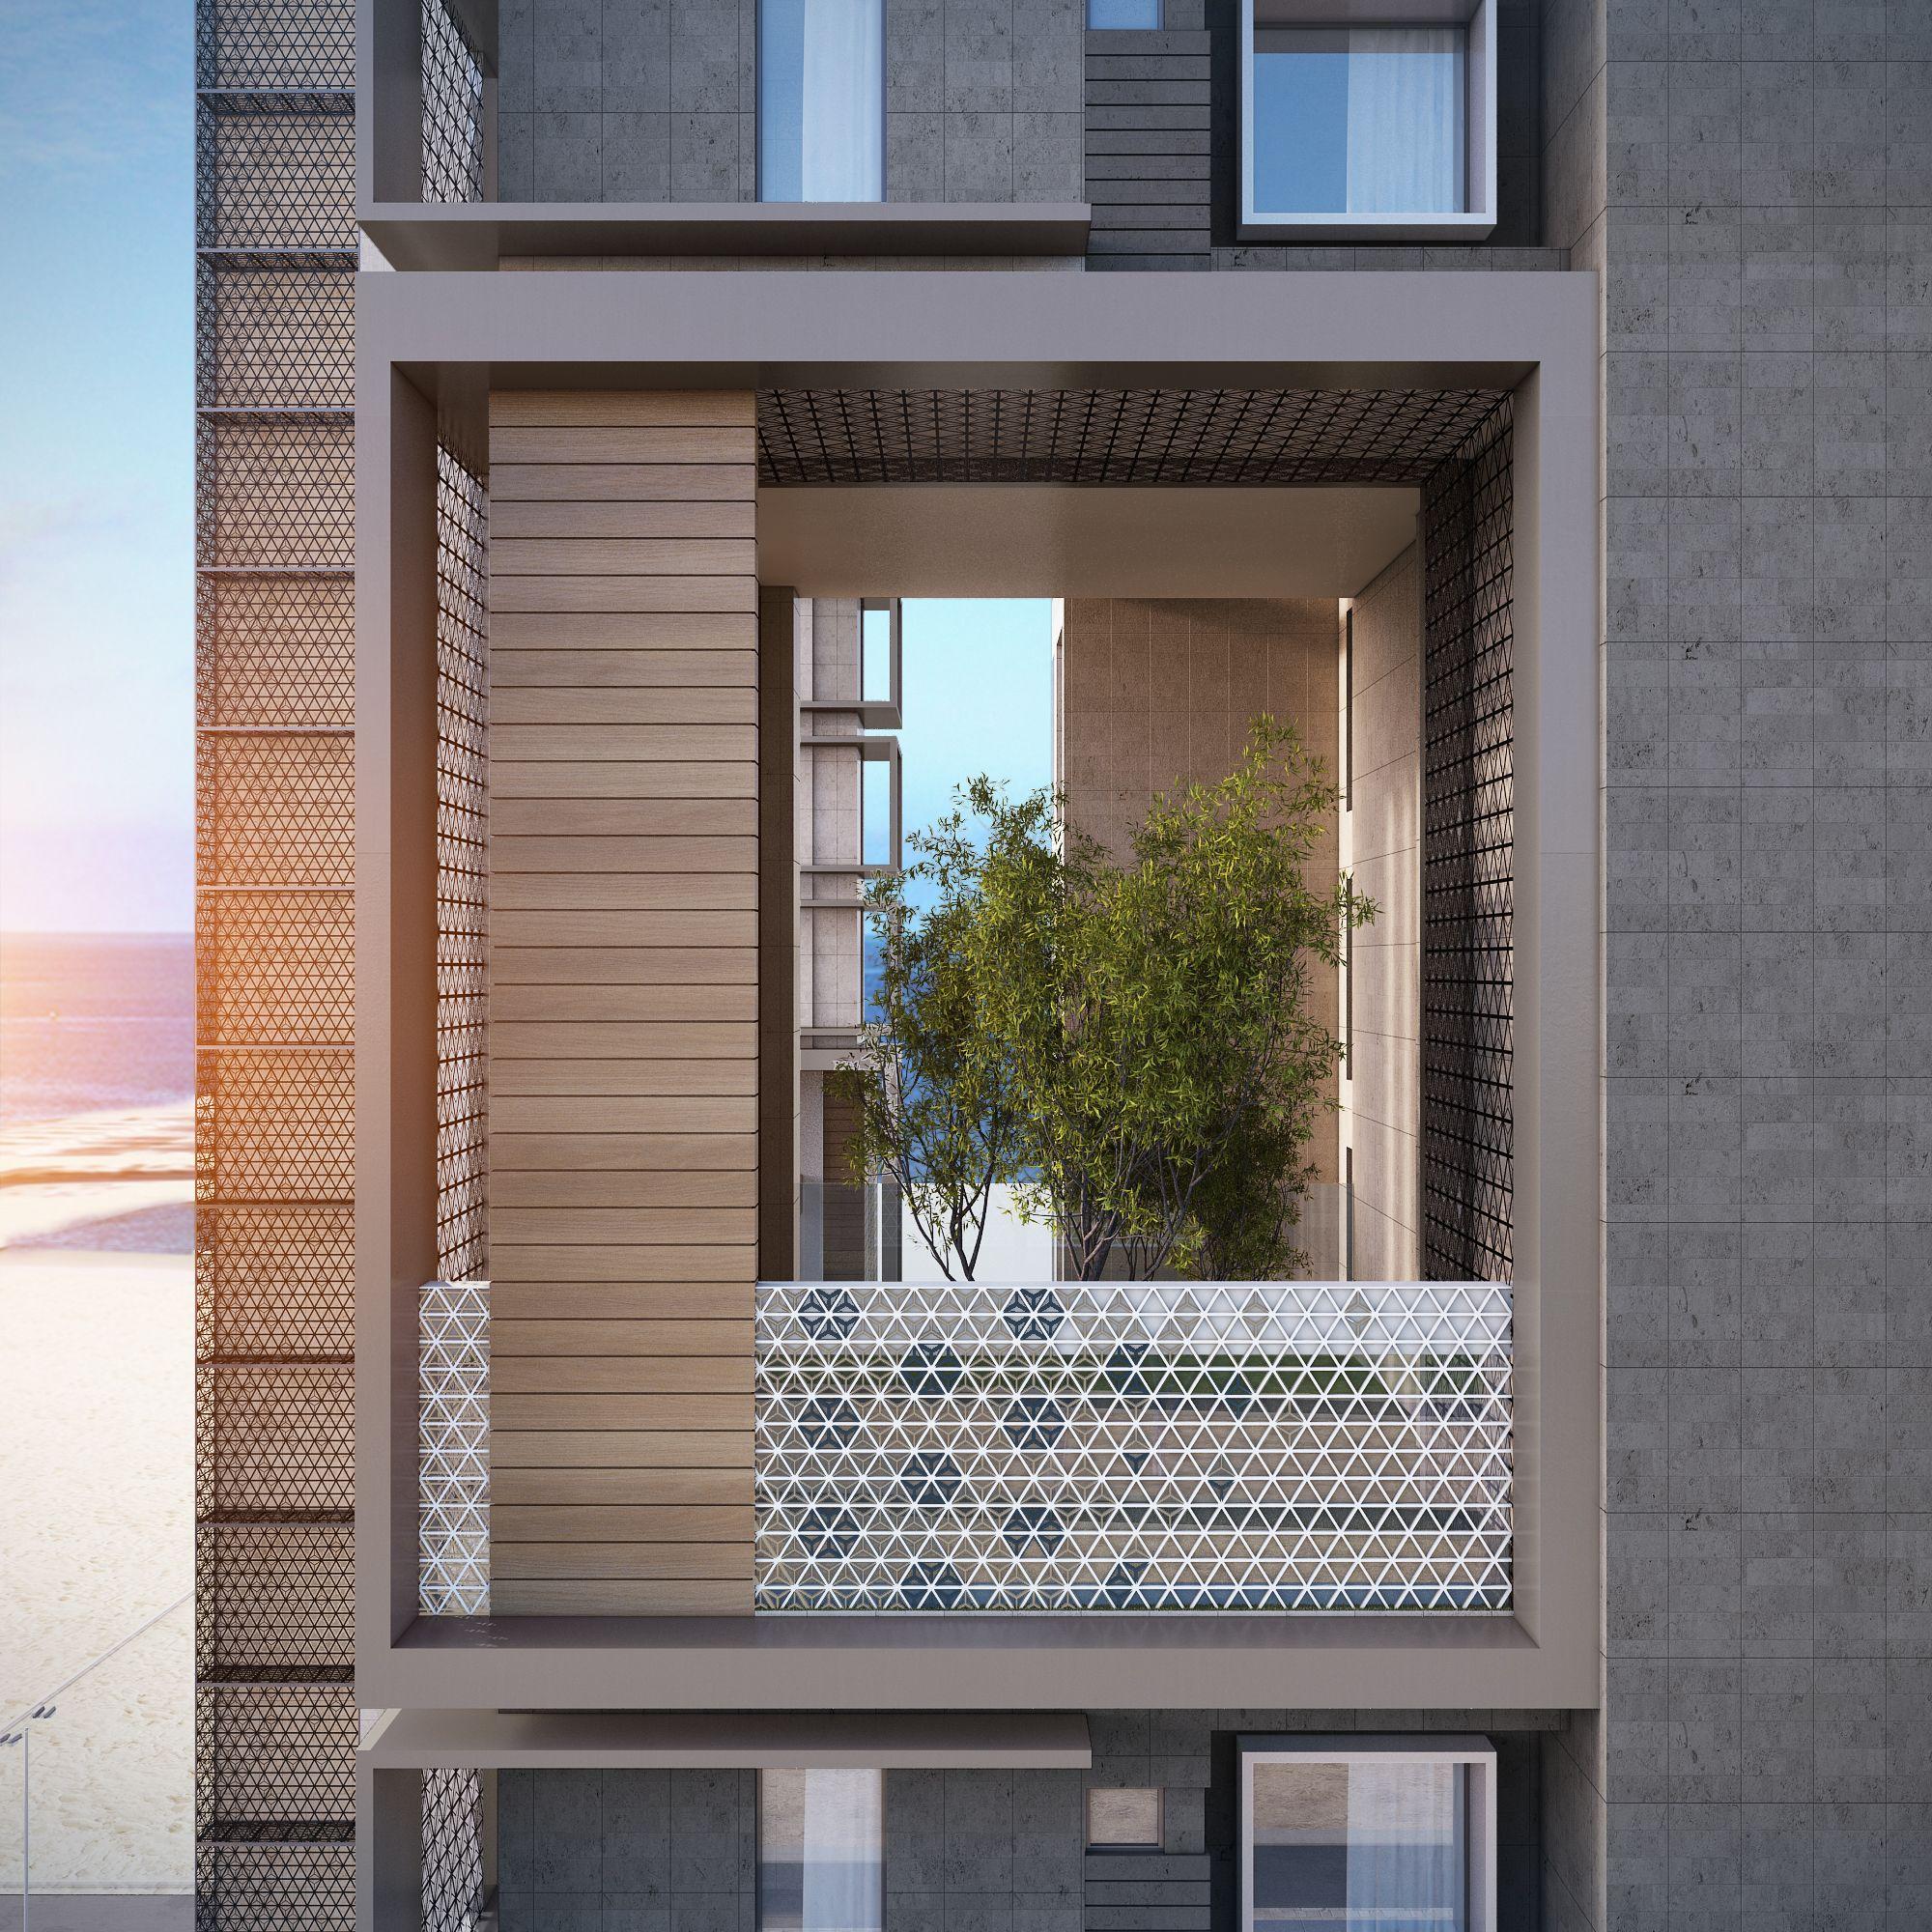 Hanging gardens apartments towers 3200 m plot kuwait